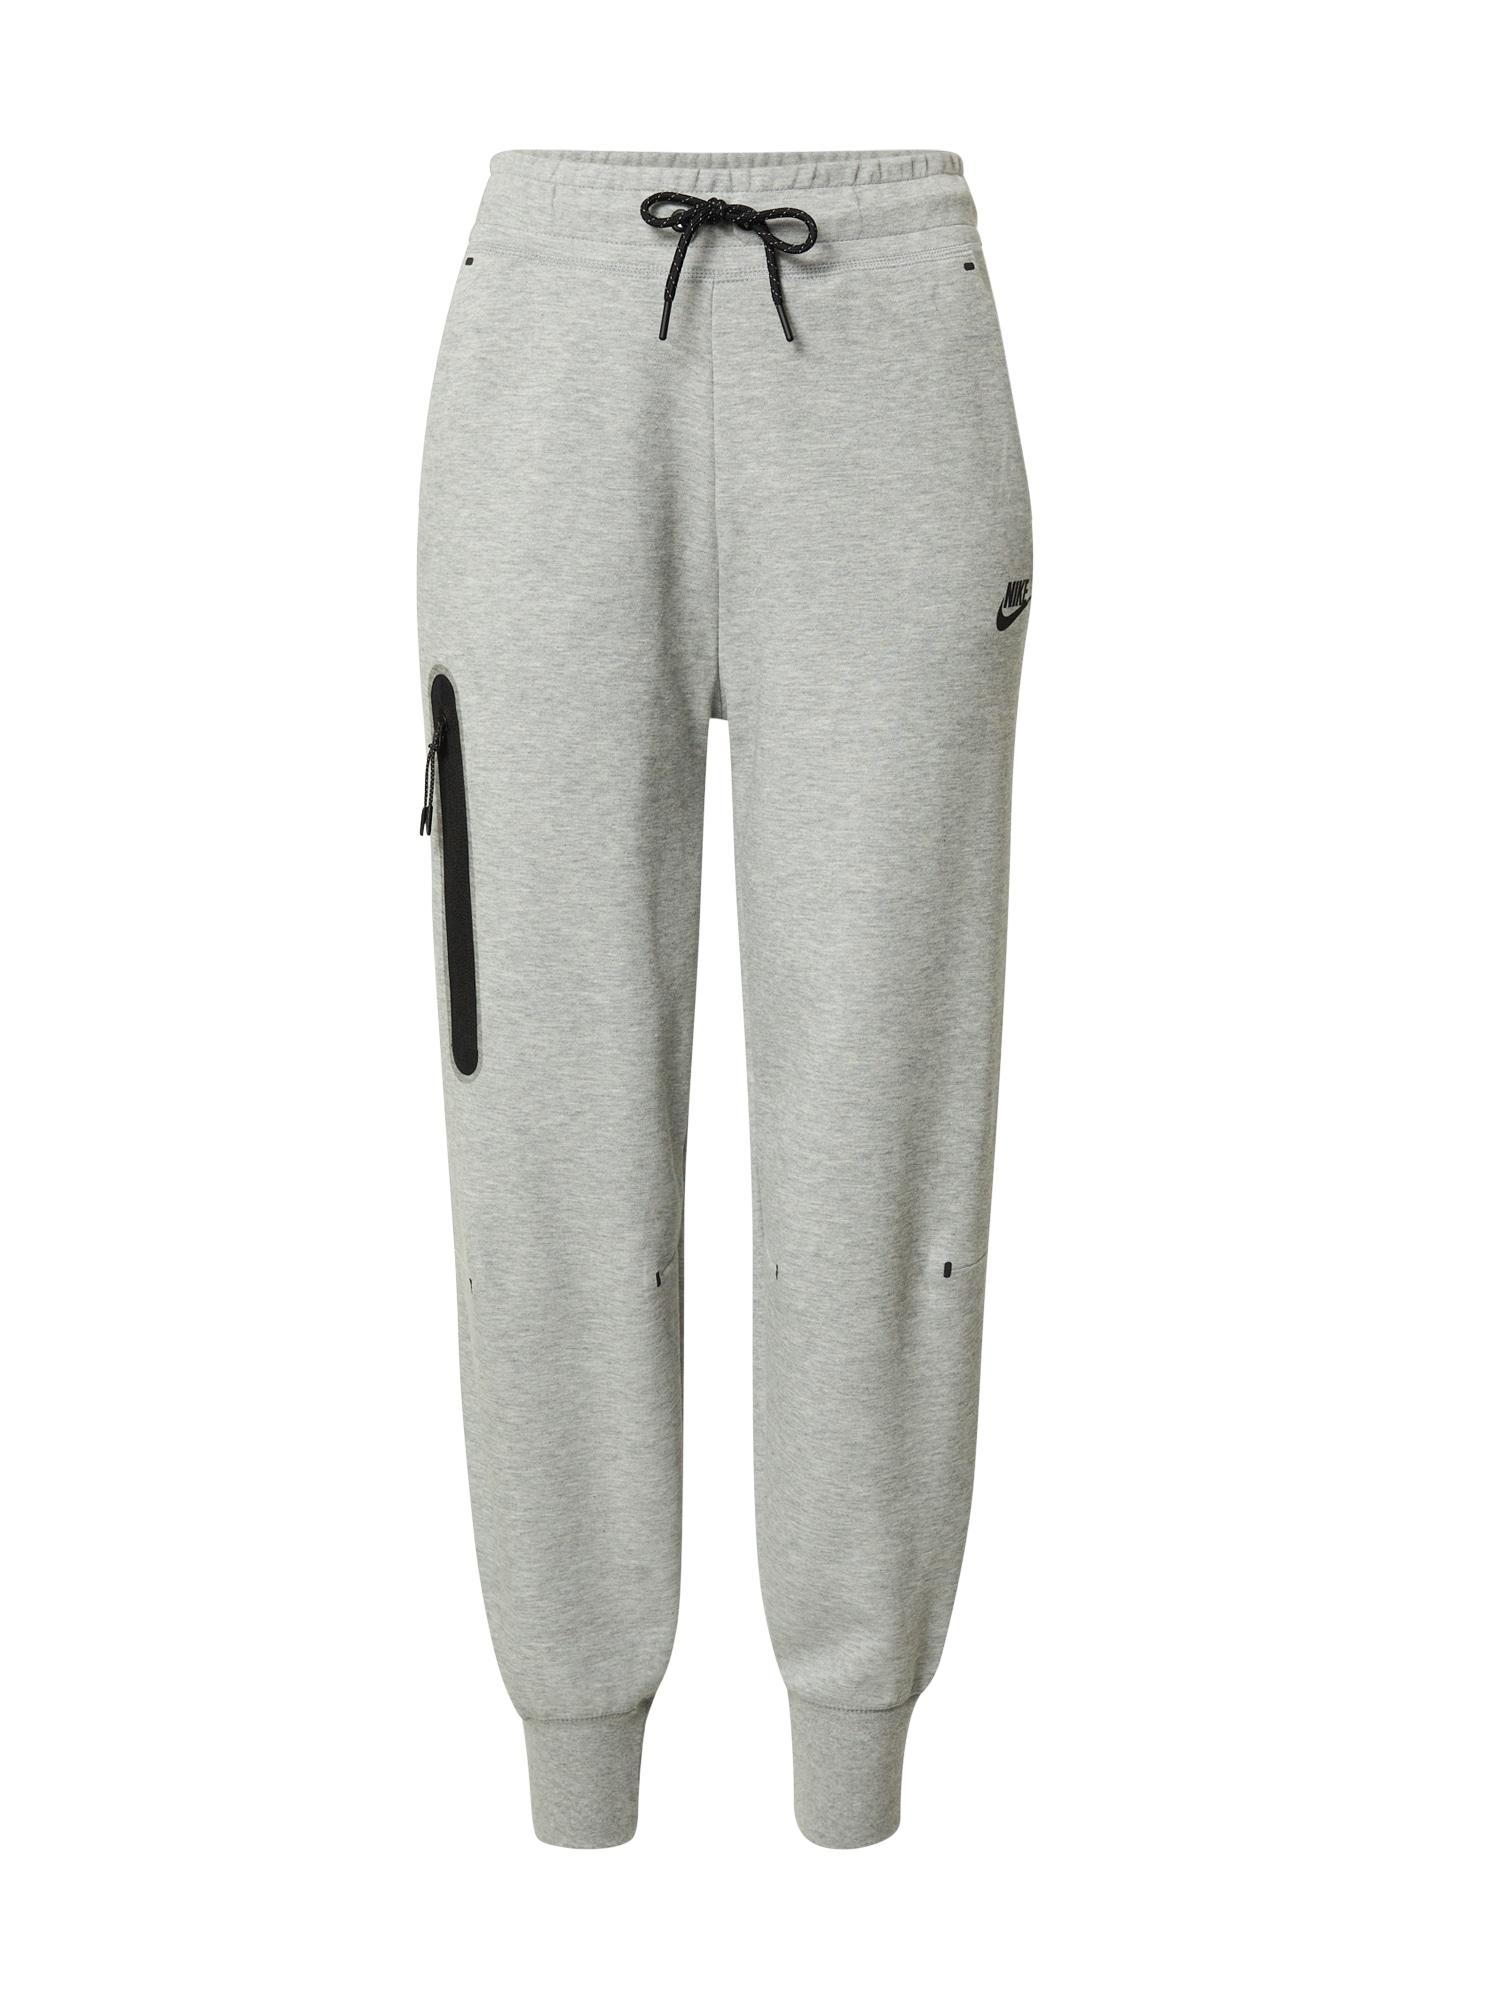 Nike Sportswear Kelnės margai pilka / juoda